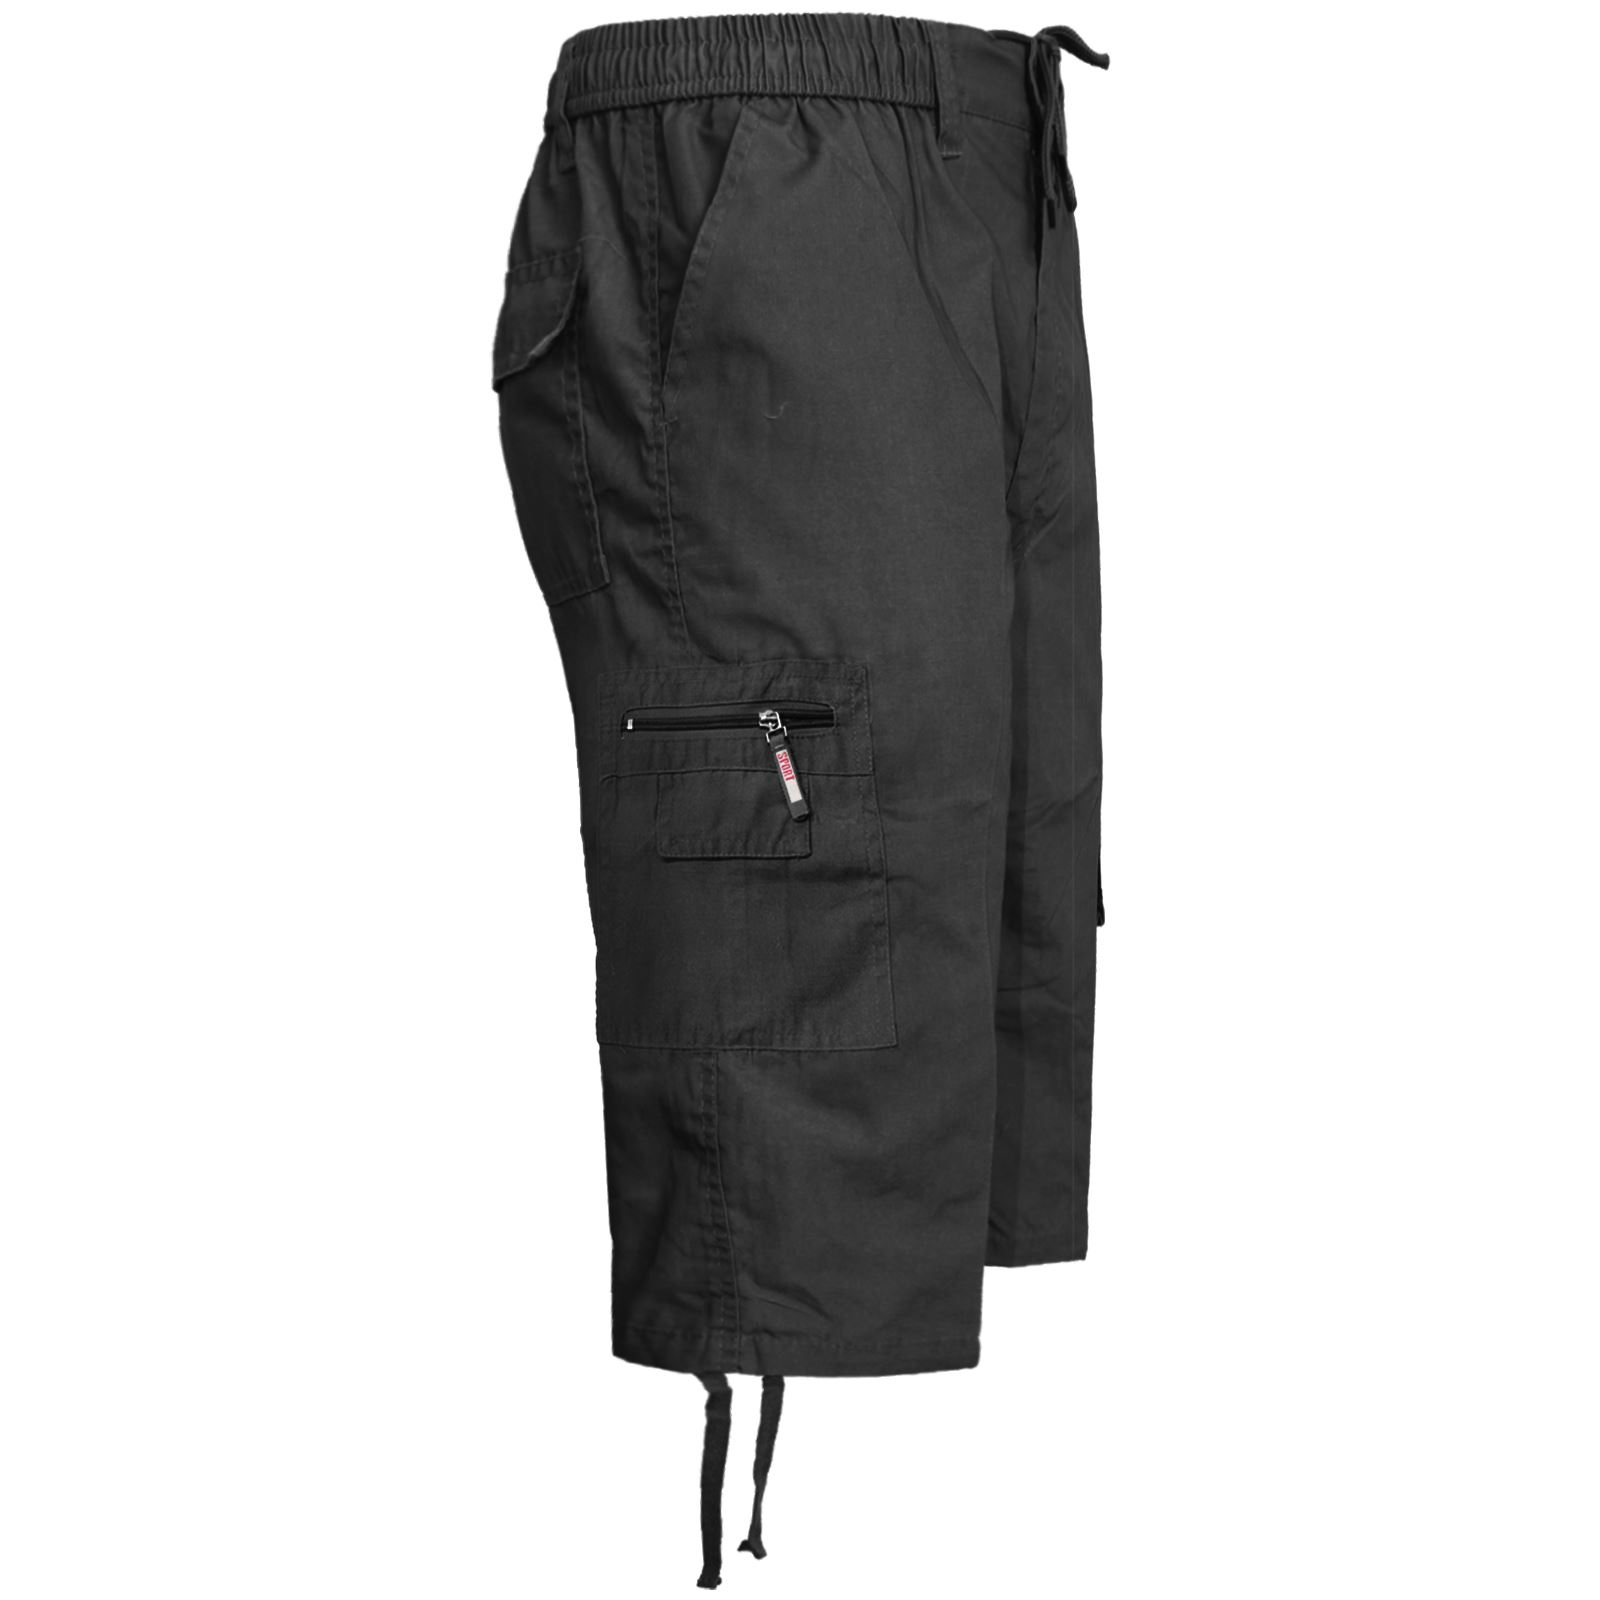 New Mens 3//4 Long Elasticated Shorts Cargo Combat Multi Pocket Summer Gym Pants